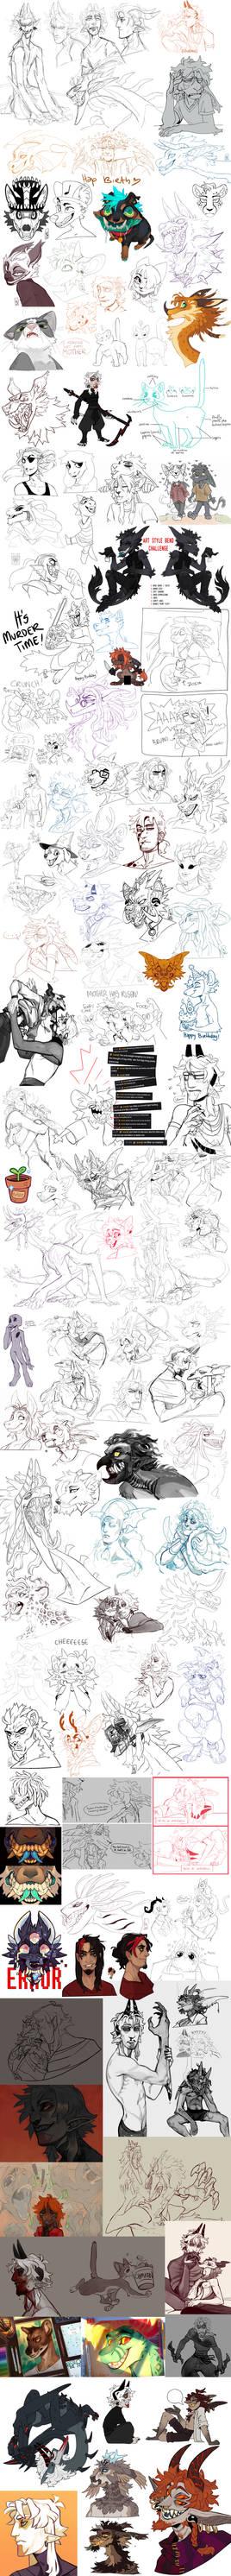 Sketchdump 72